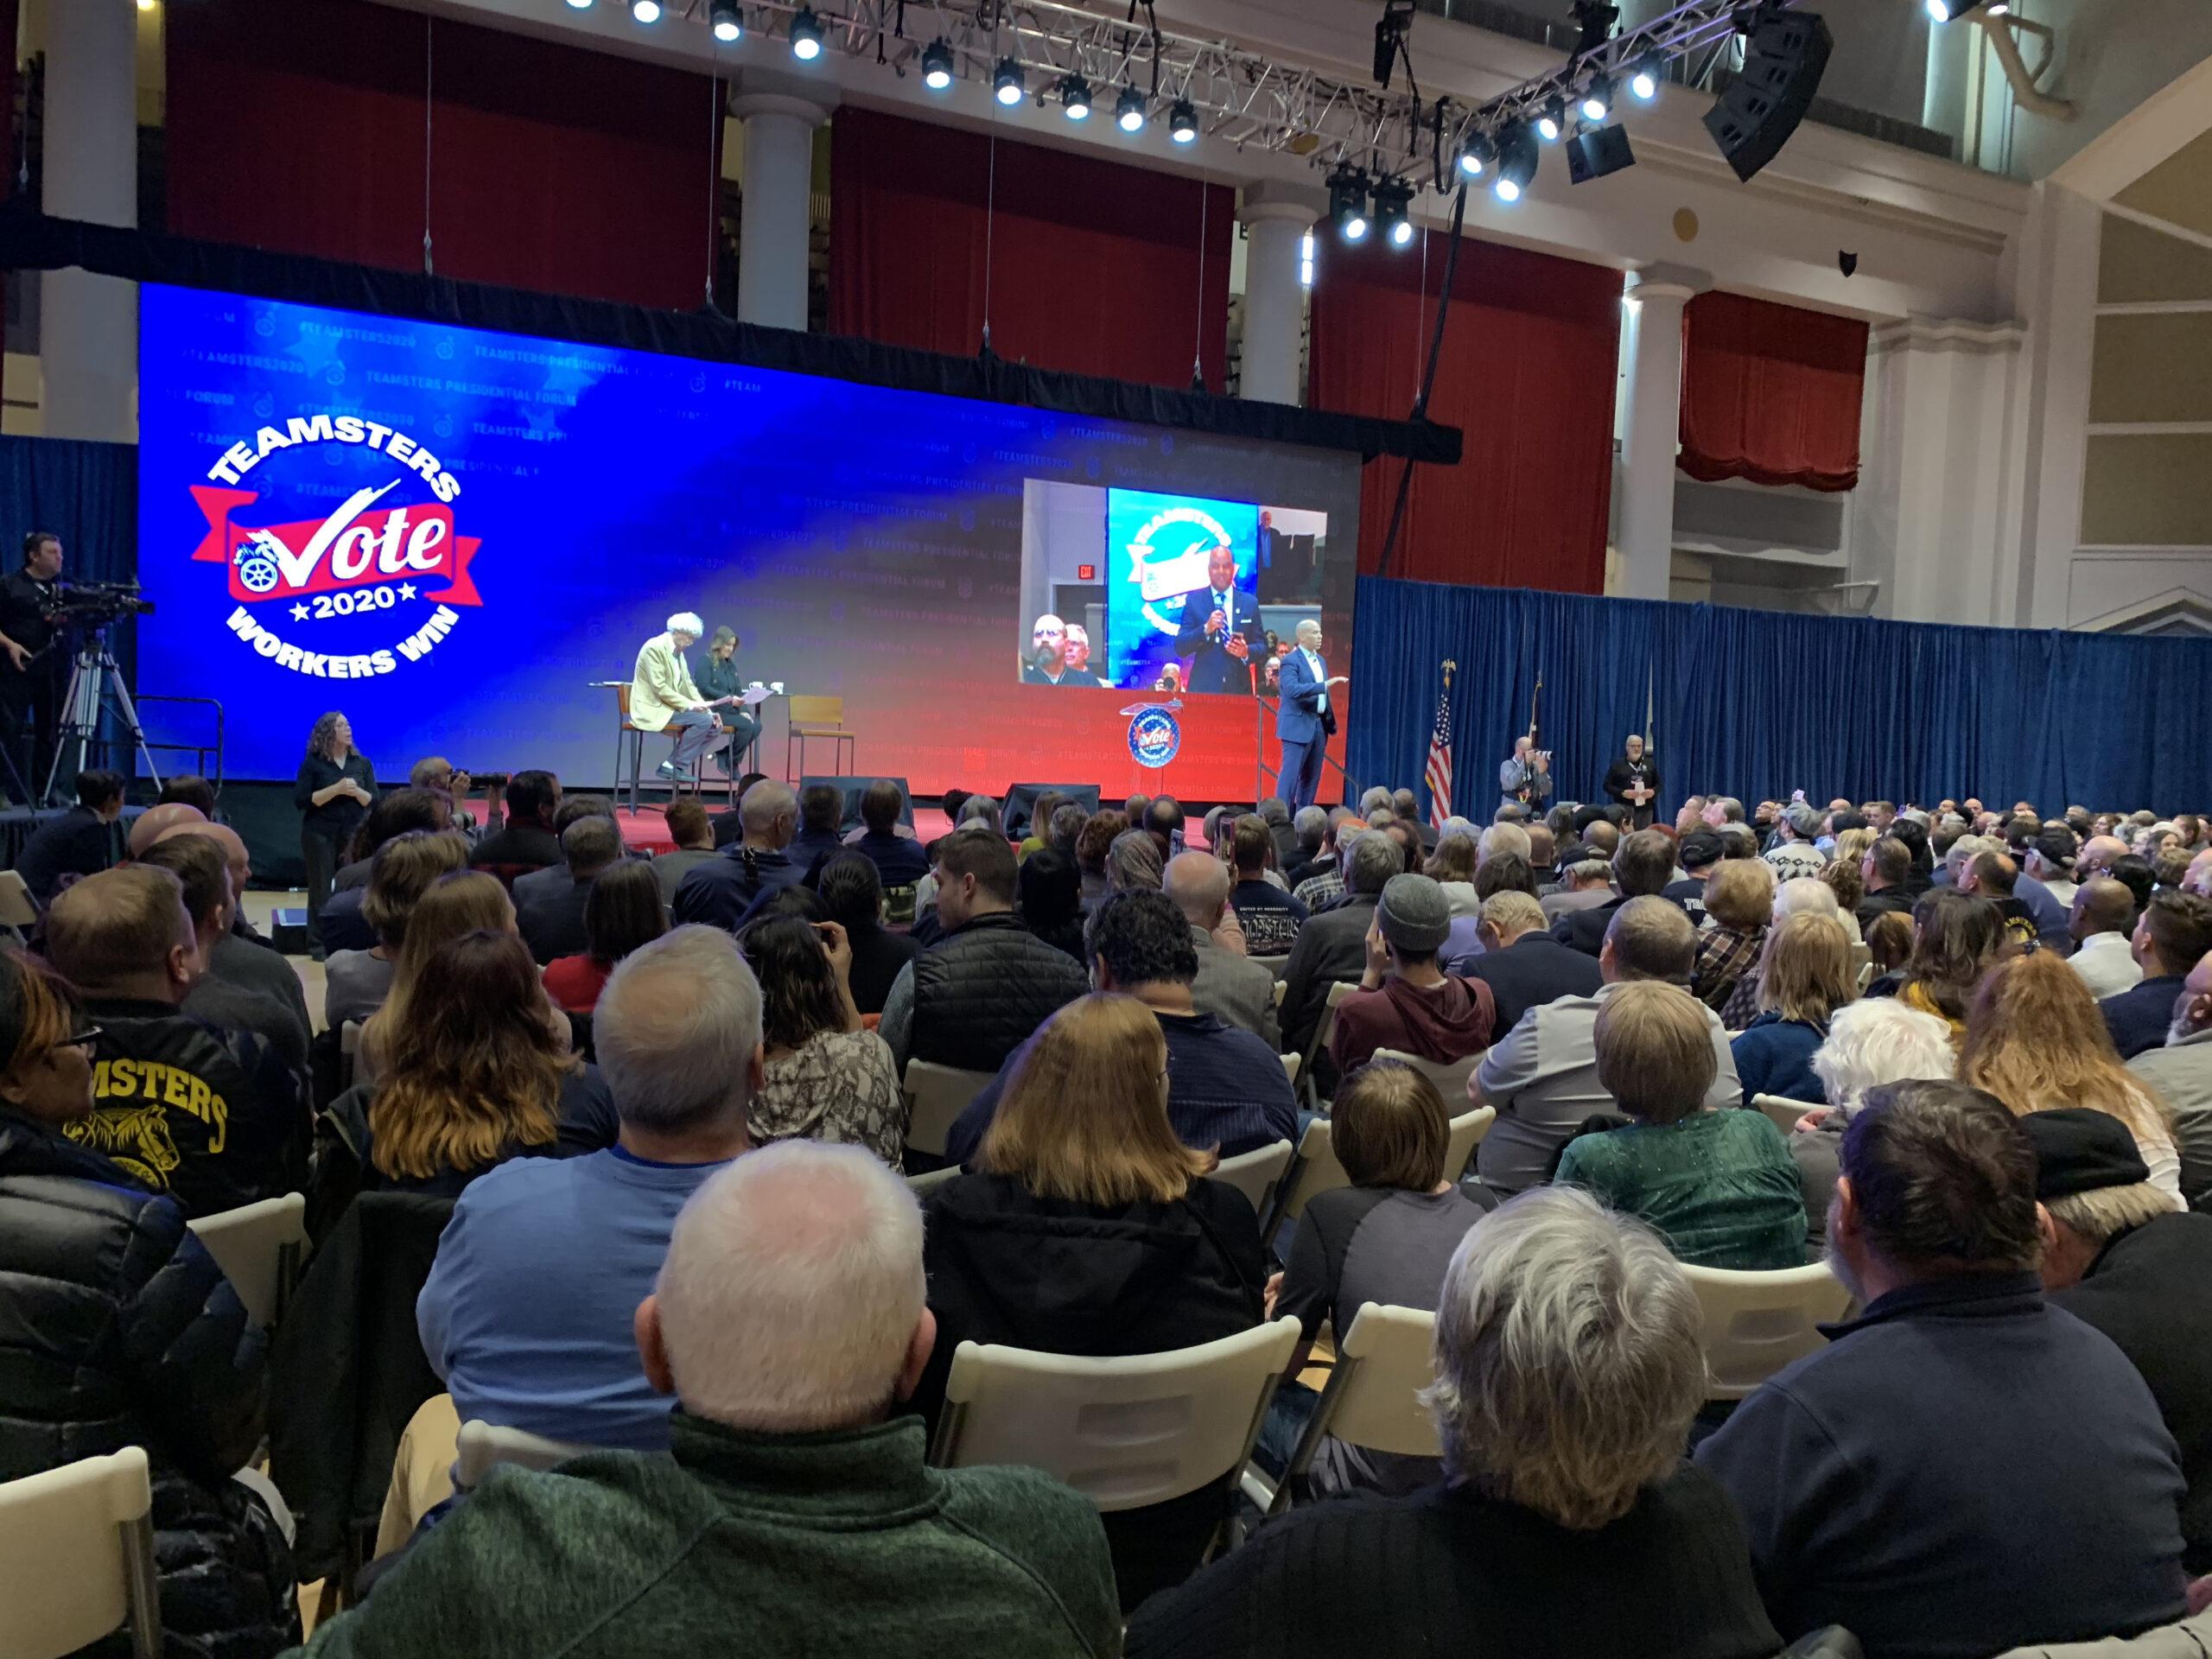 Cory Booker at Teamsters Presidential Forum in December 7, 2019Cory Booker at Teamsters Presidential Forum in December 7, 2019